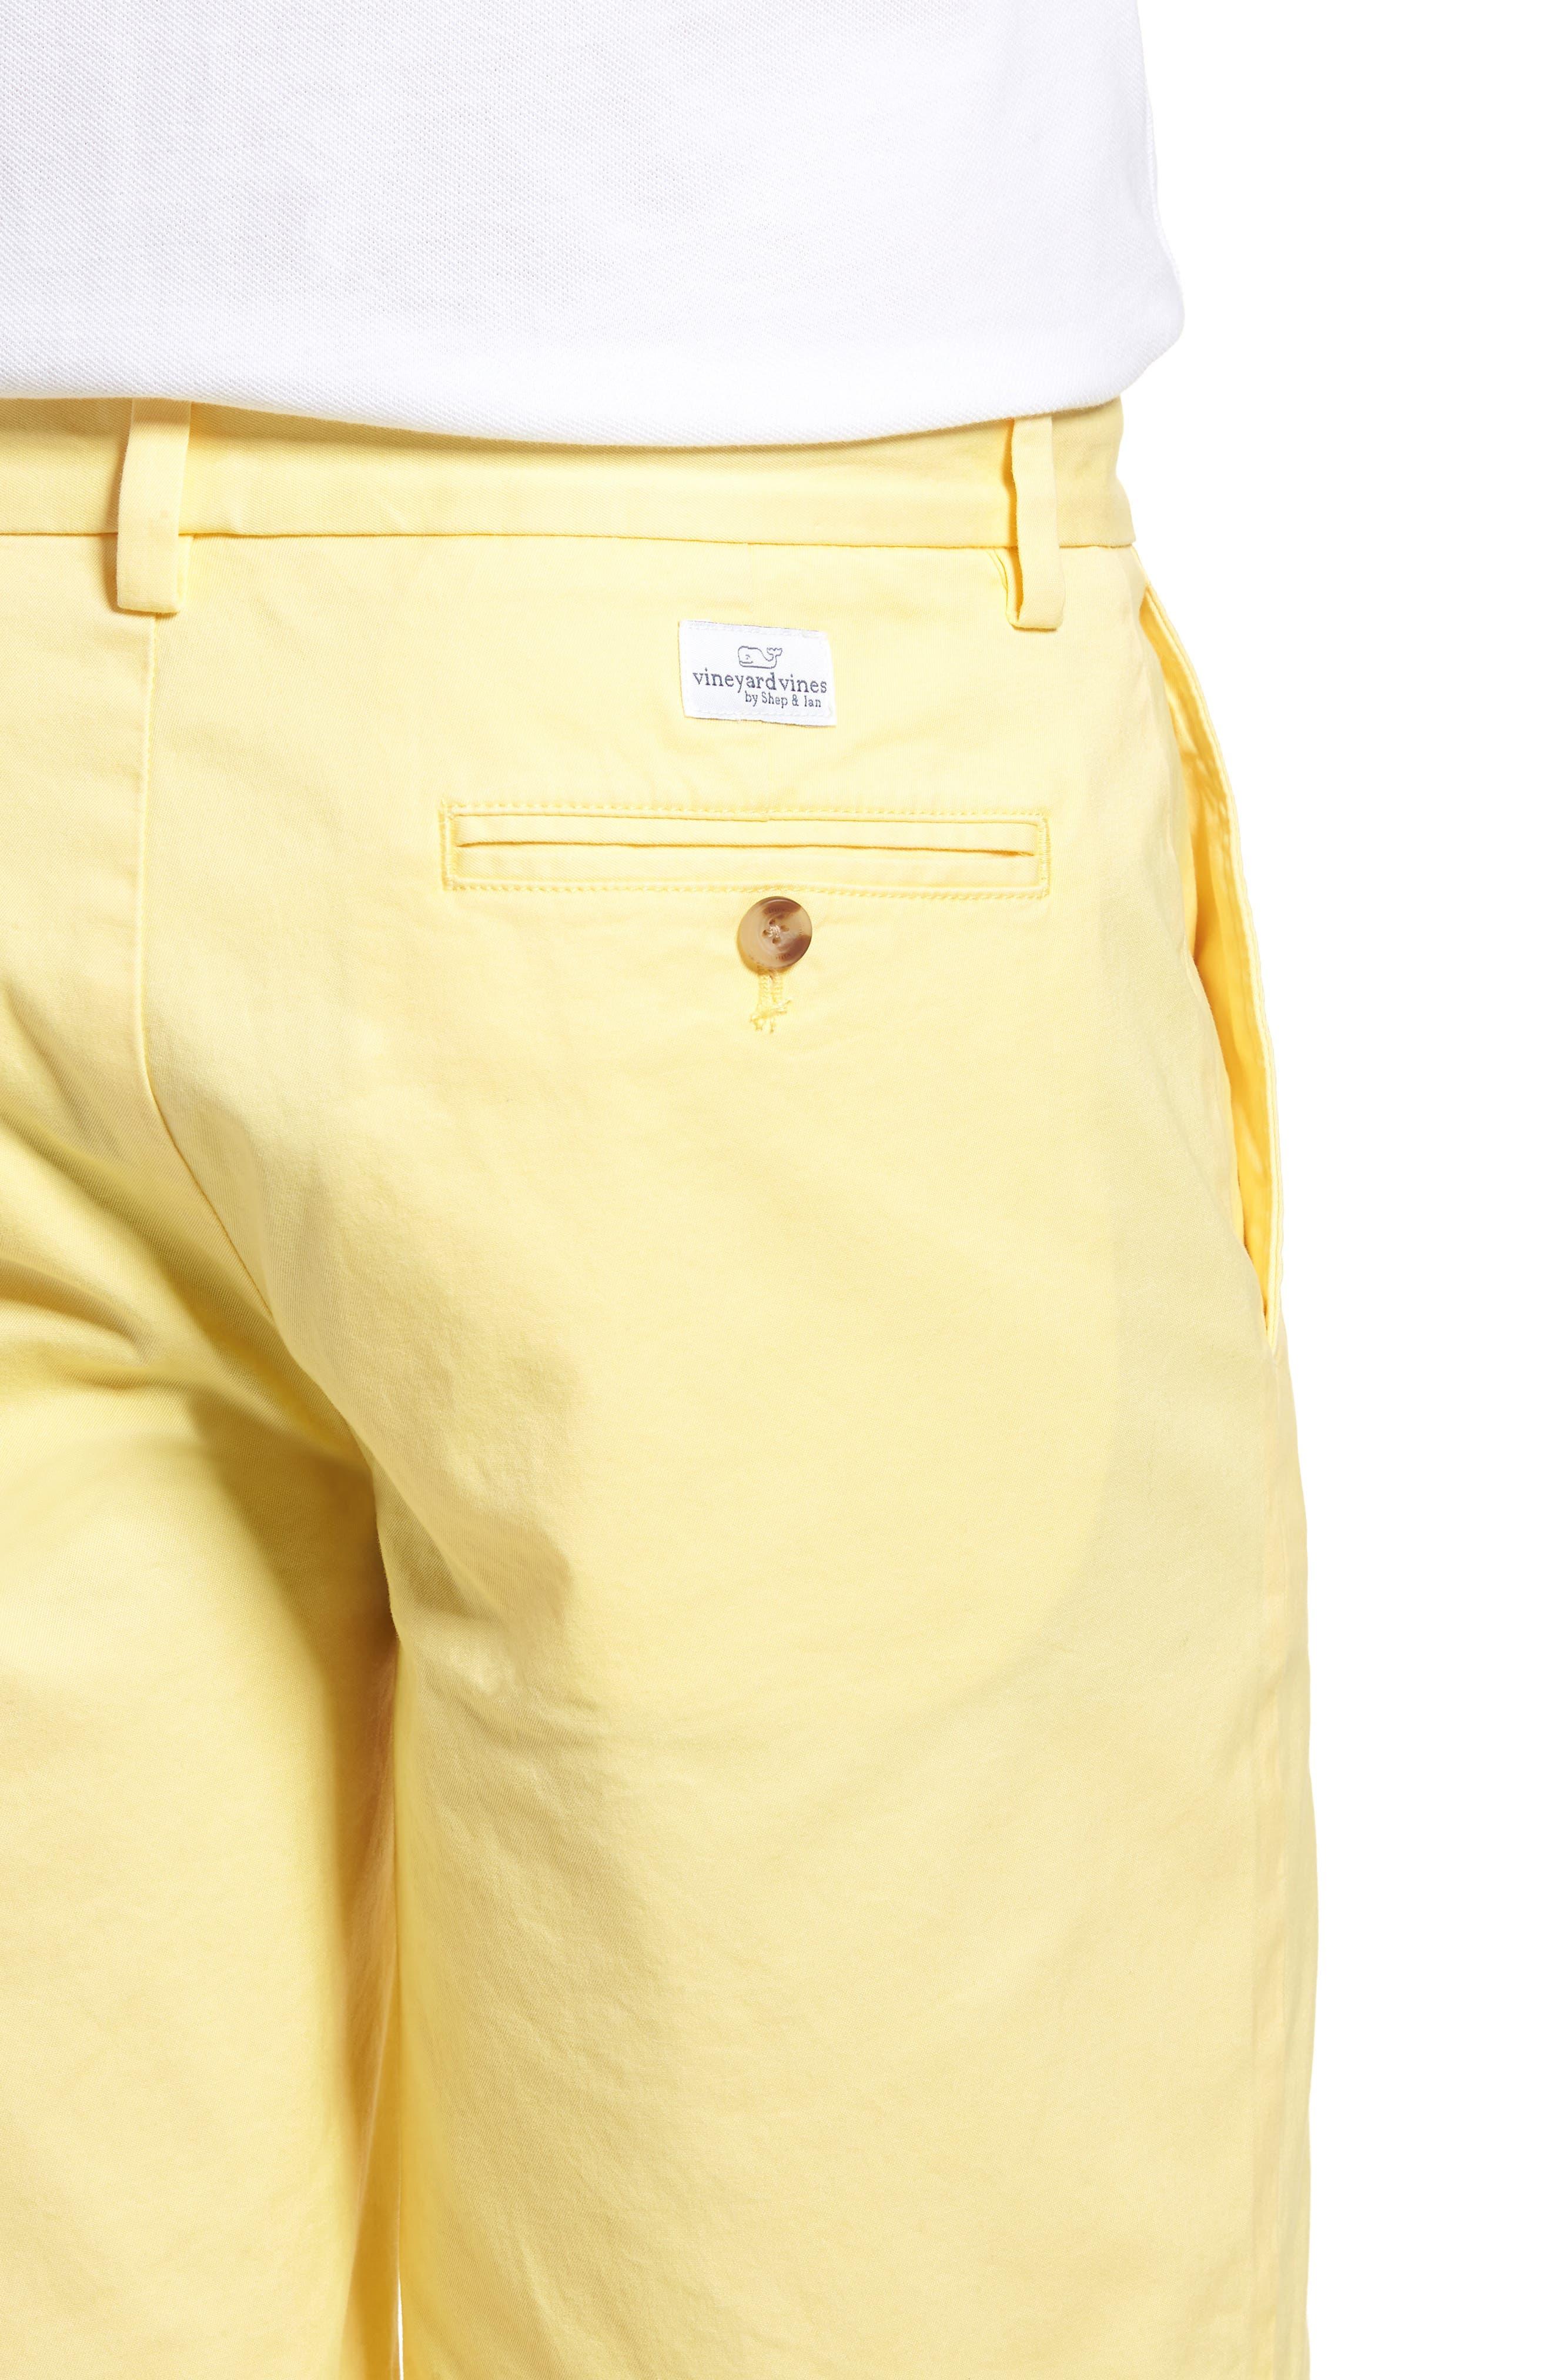 9 Inch Stretch Breaker Shorts,                             Alternate thumbnail 77, color,